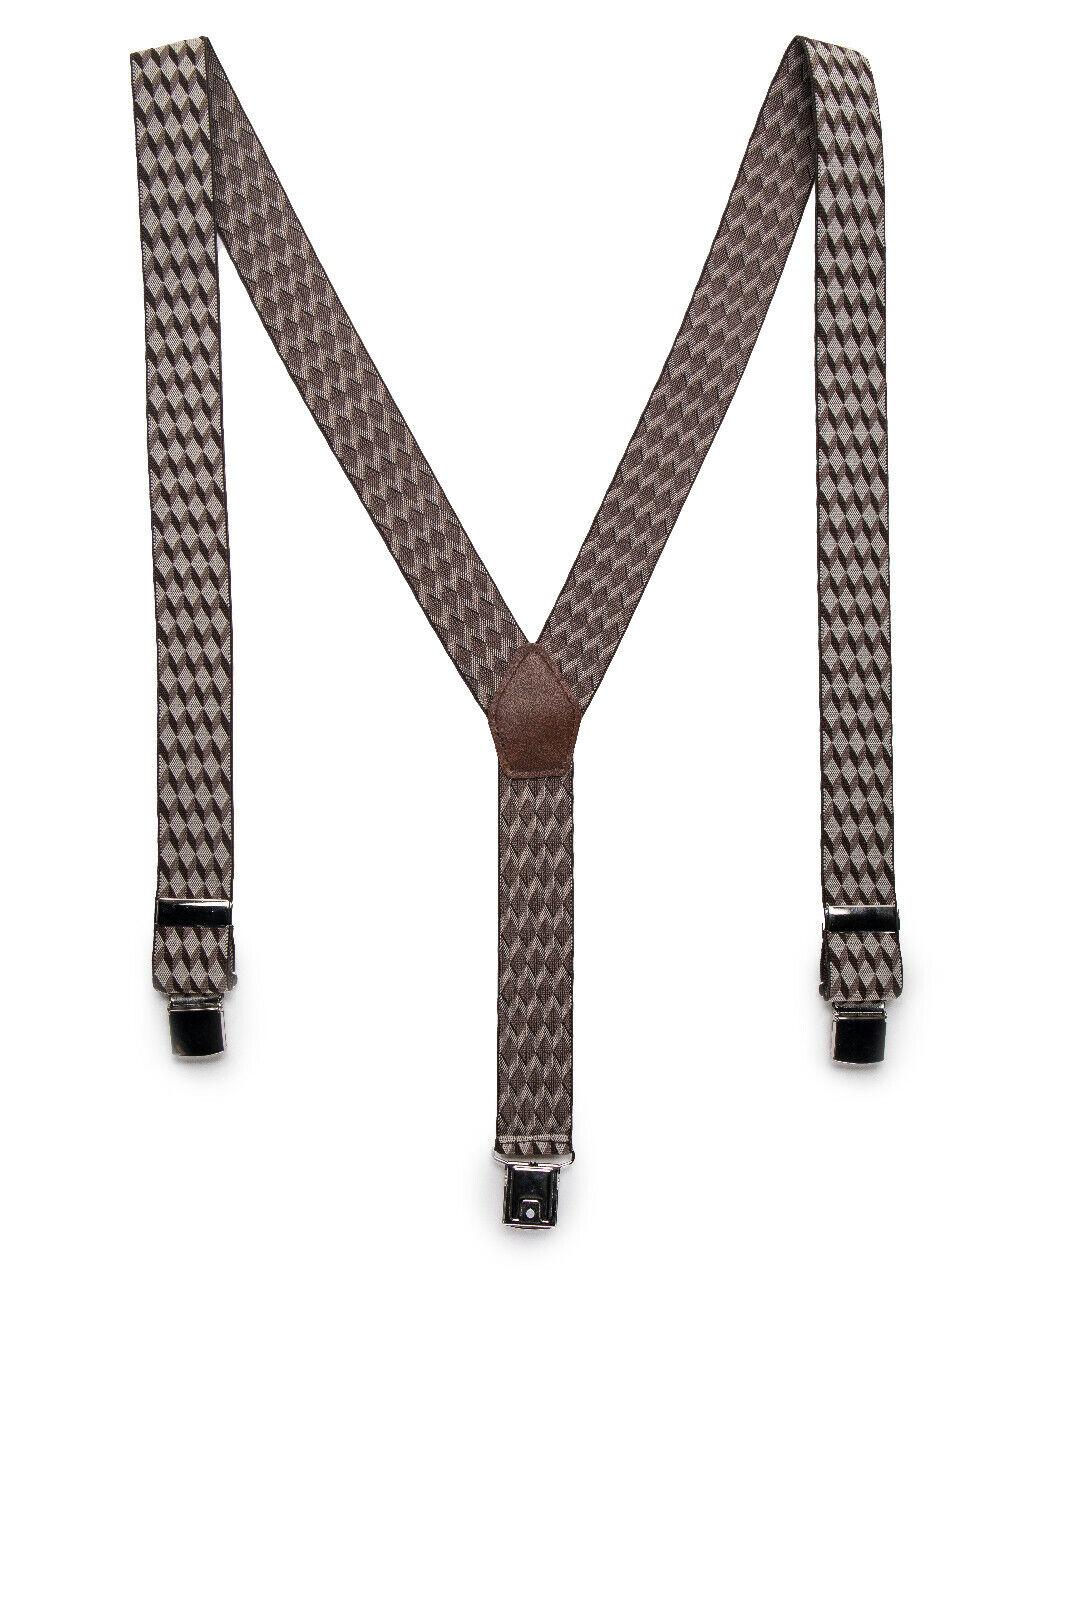 Clip Fashion Dress Vegan Brace on Chechered Plaid Geometric Elastic & Adjustable